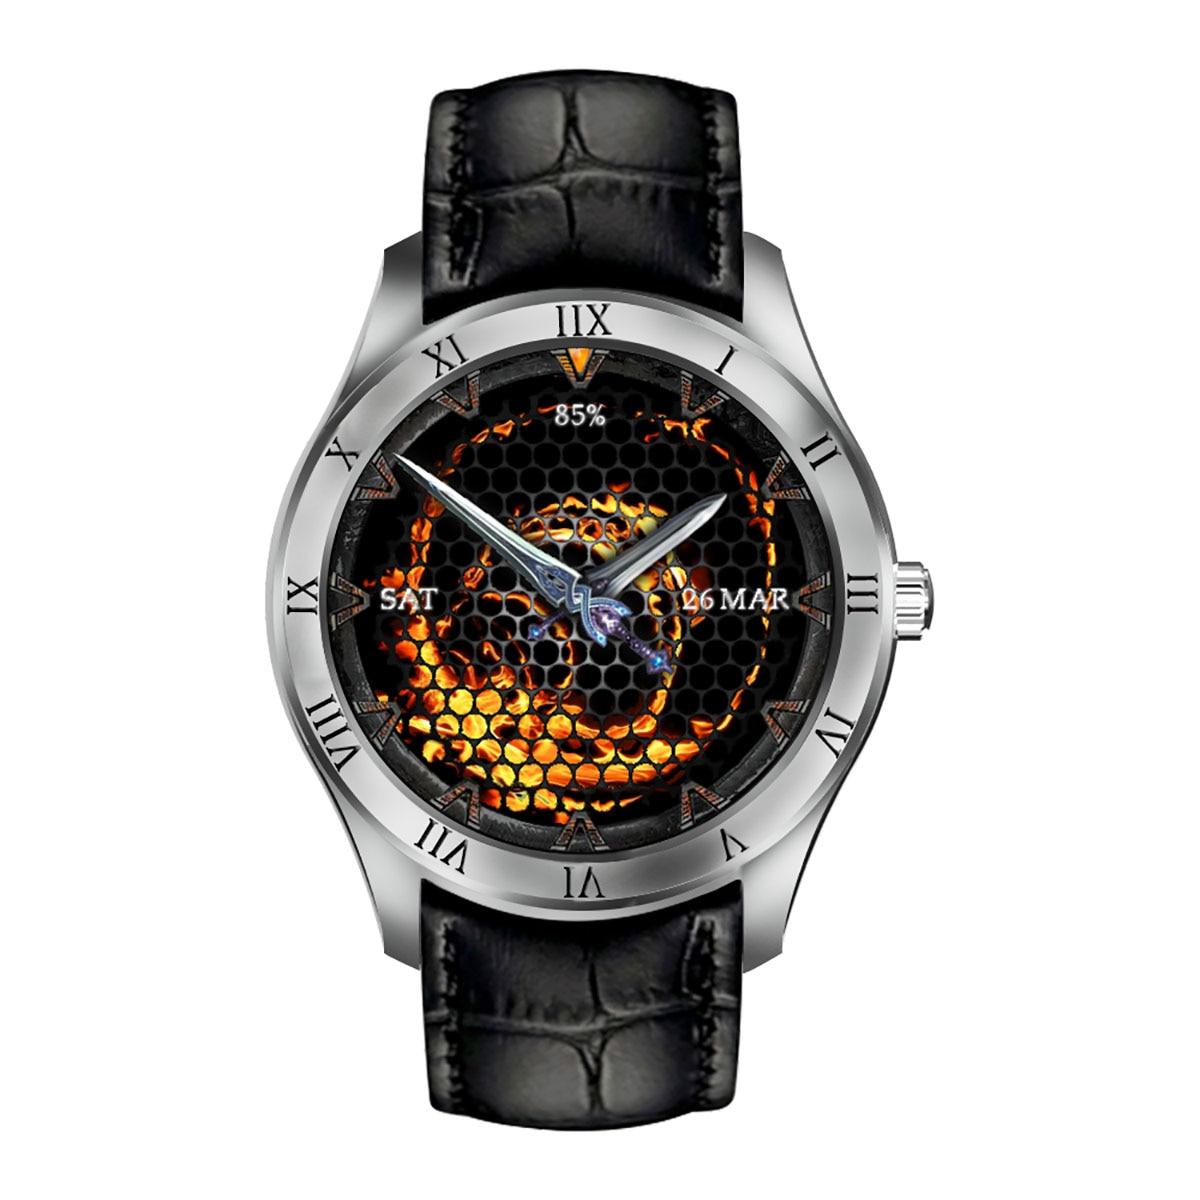 Diggro DI05 Smart Bluetooth 4.0 watch MTK6580 1.3GHZ Quad Core RAM/ROM 512MB+8GB Support 3G NANO SIM Card WIFI GPS diggro di05 smart watch wifi gps mtk6580 bluetooth 4 0 512mb 8gb support 3g nano sim card 1 39inch amoled smart watch pk k88h